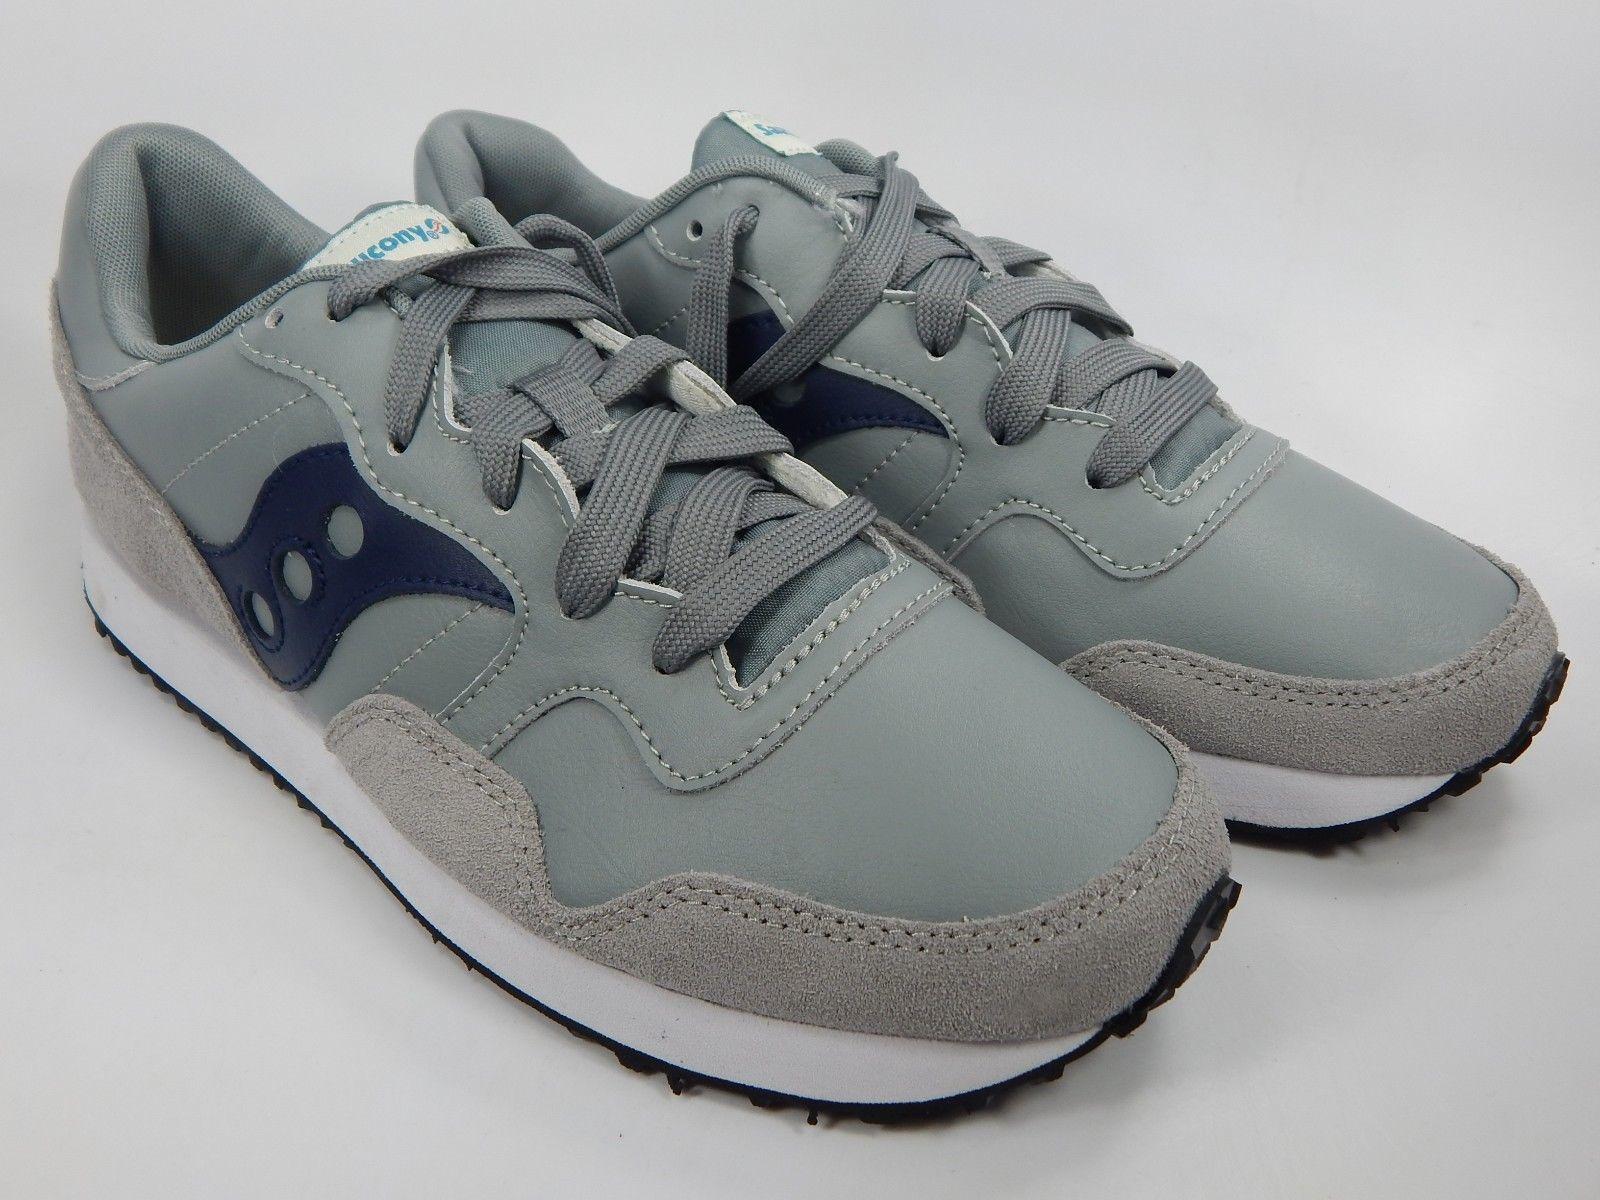 Saucony Originals DXN Trainer CL Men's Running Shoes Sz 9 M (D) EU 42.5 S70358-5